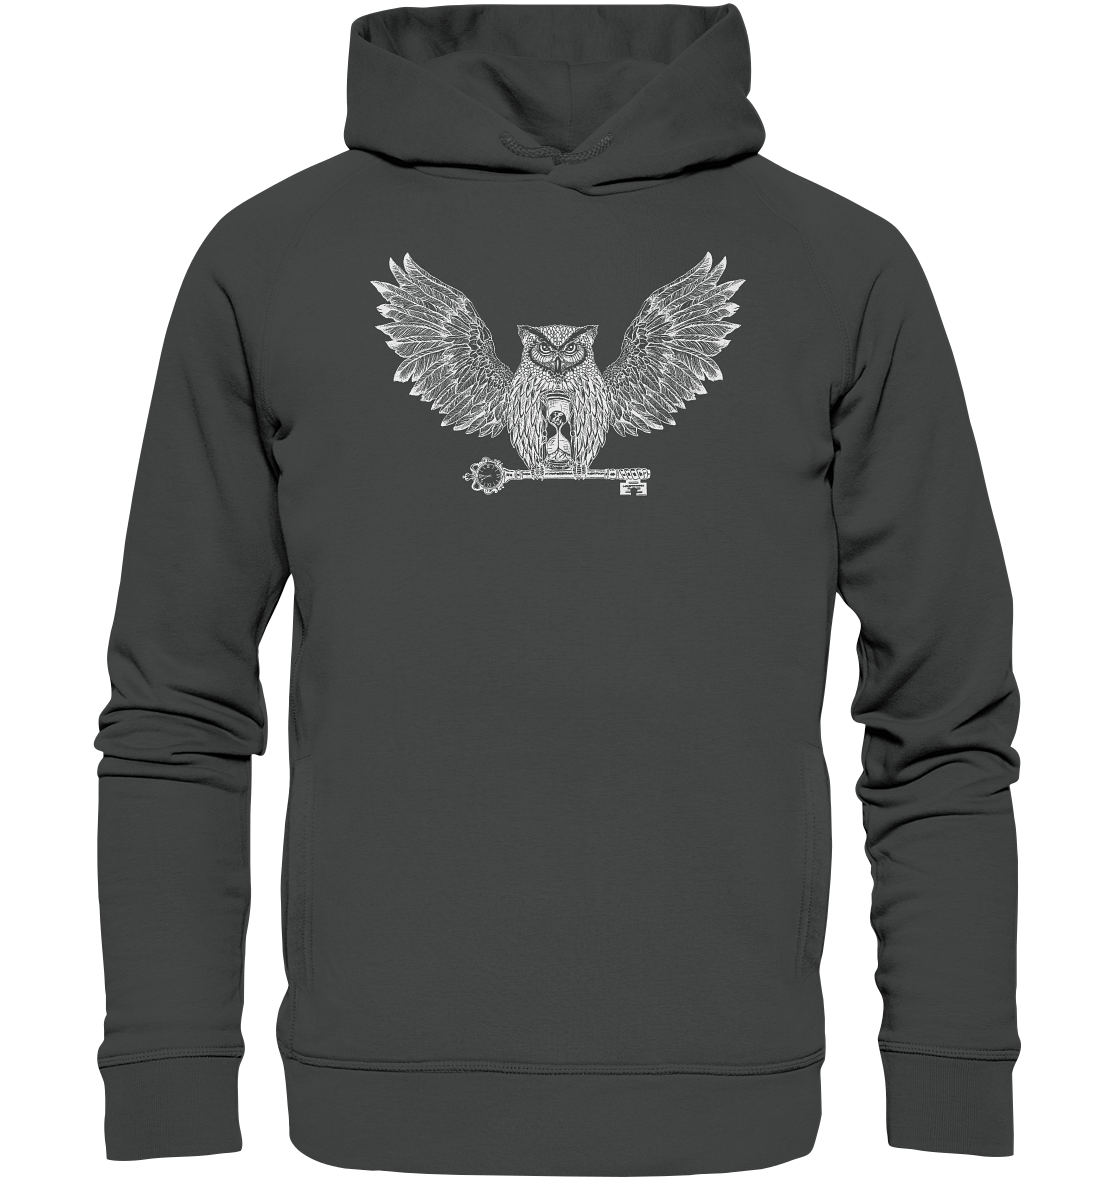 front-organic-fashion-hoodie-444545-1116x-4.png